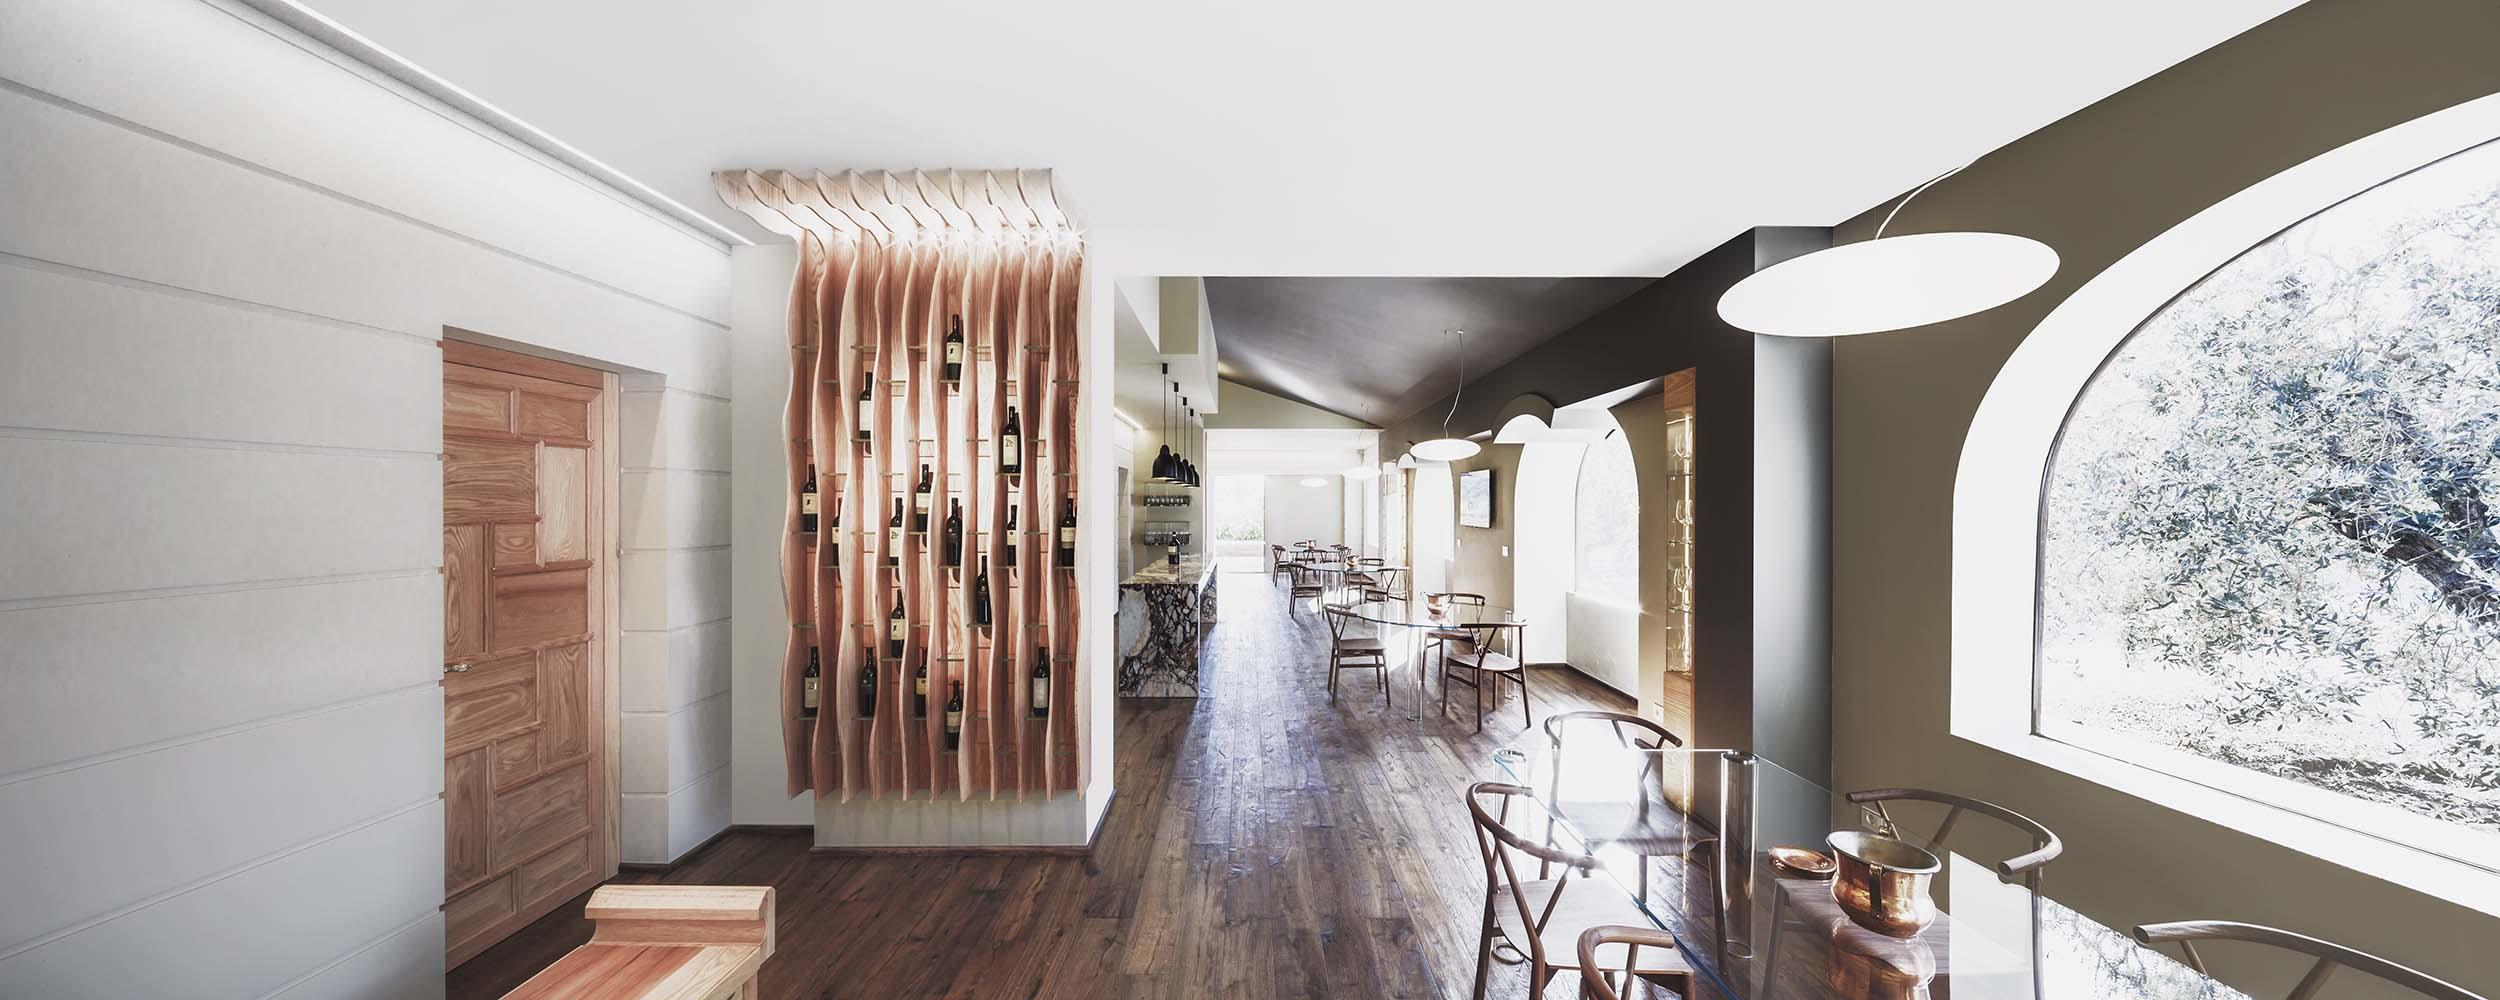 interior design photographer 29.jpg